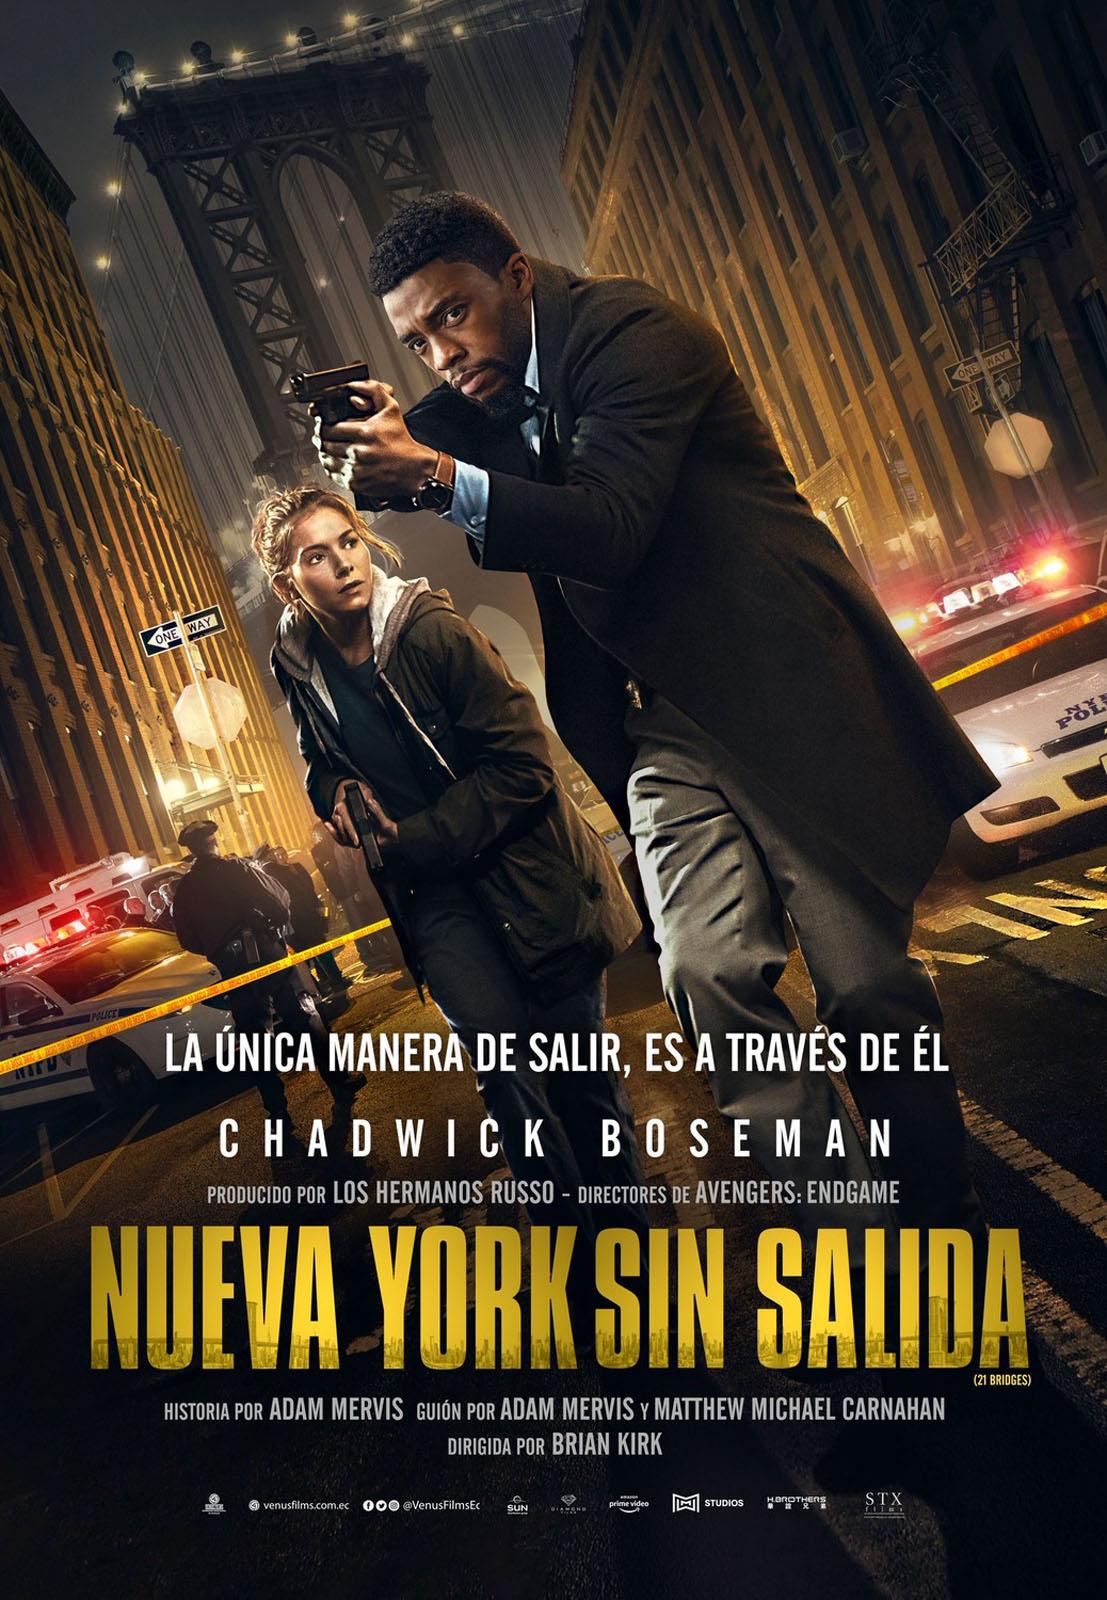 21 - The Movie